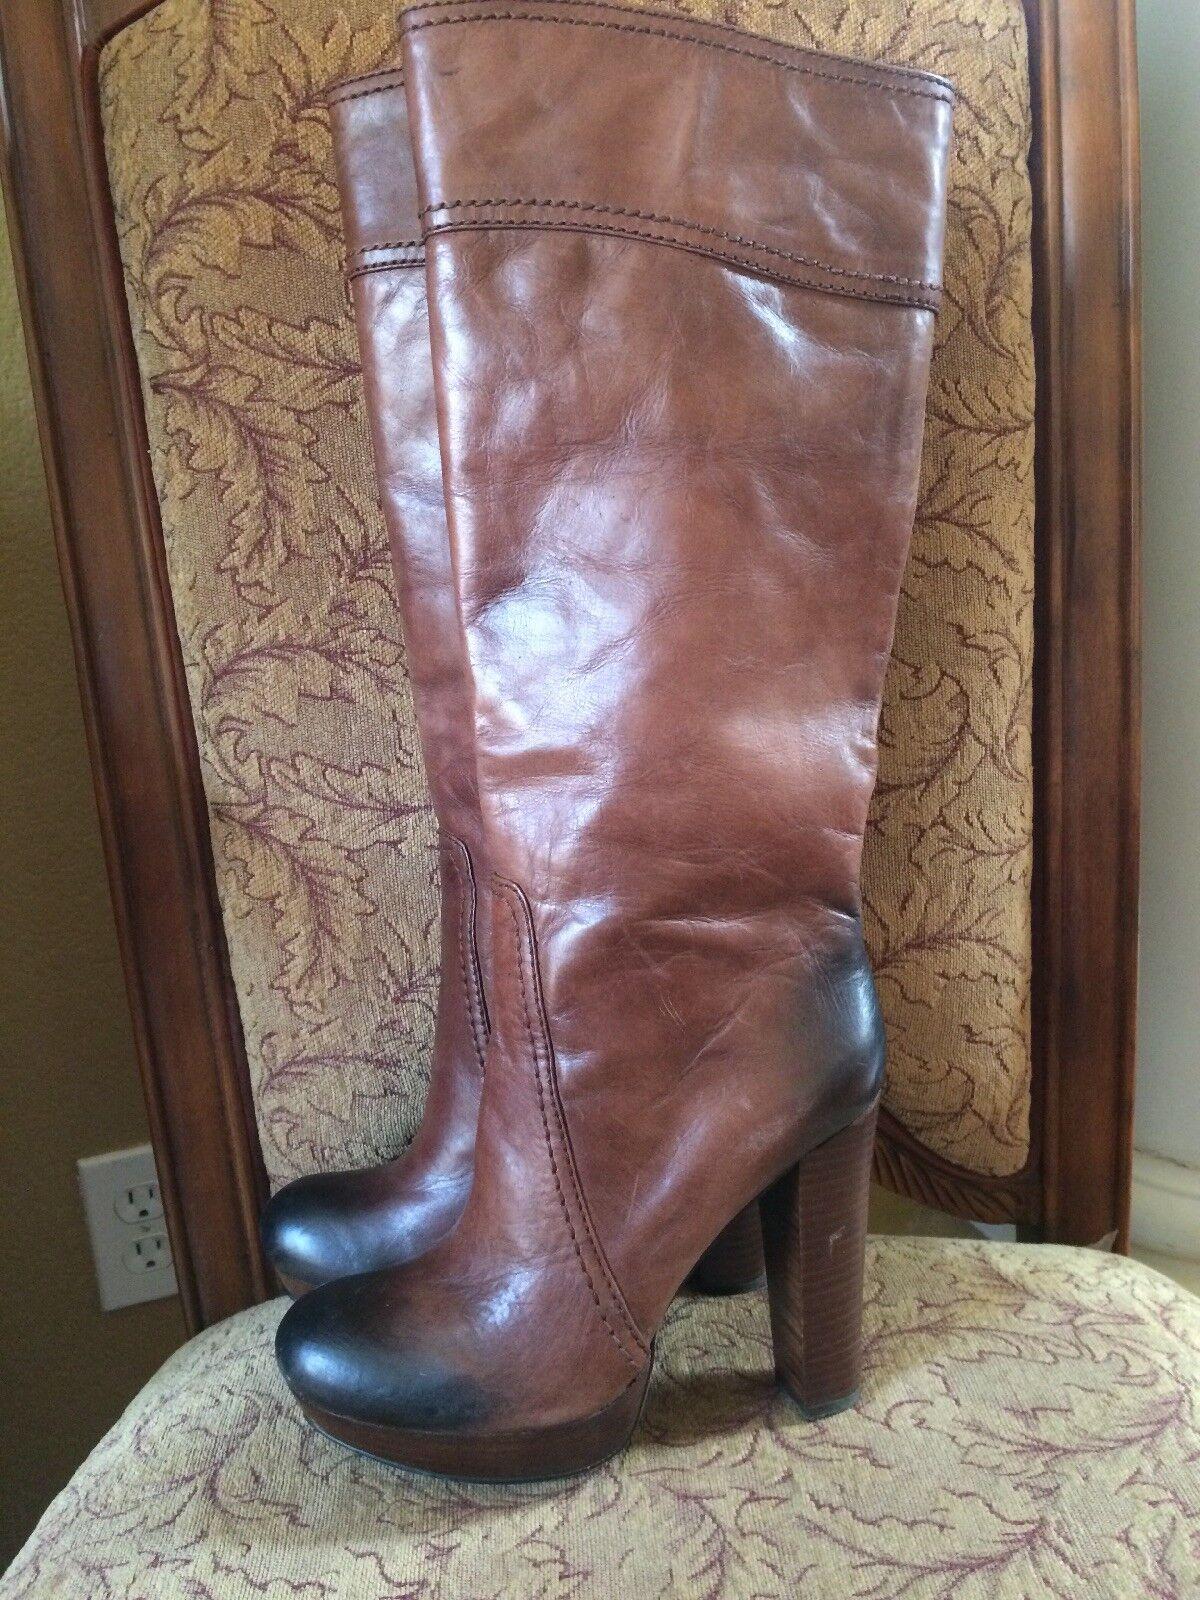 Vince Camuto damen's Tall braun Leather Stiefel Stiefel Stiefel Größe 10 KNEE SOLID 9c39a4